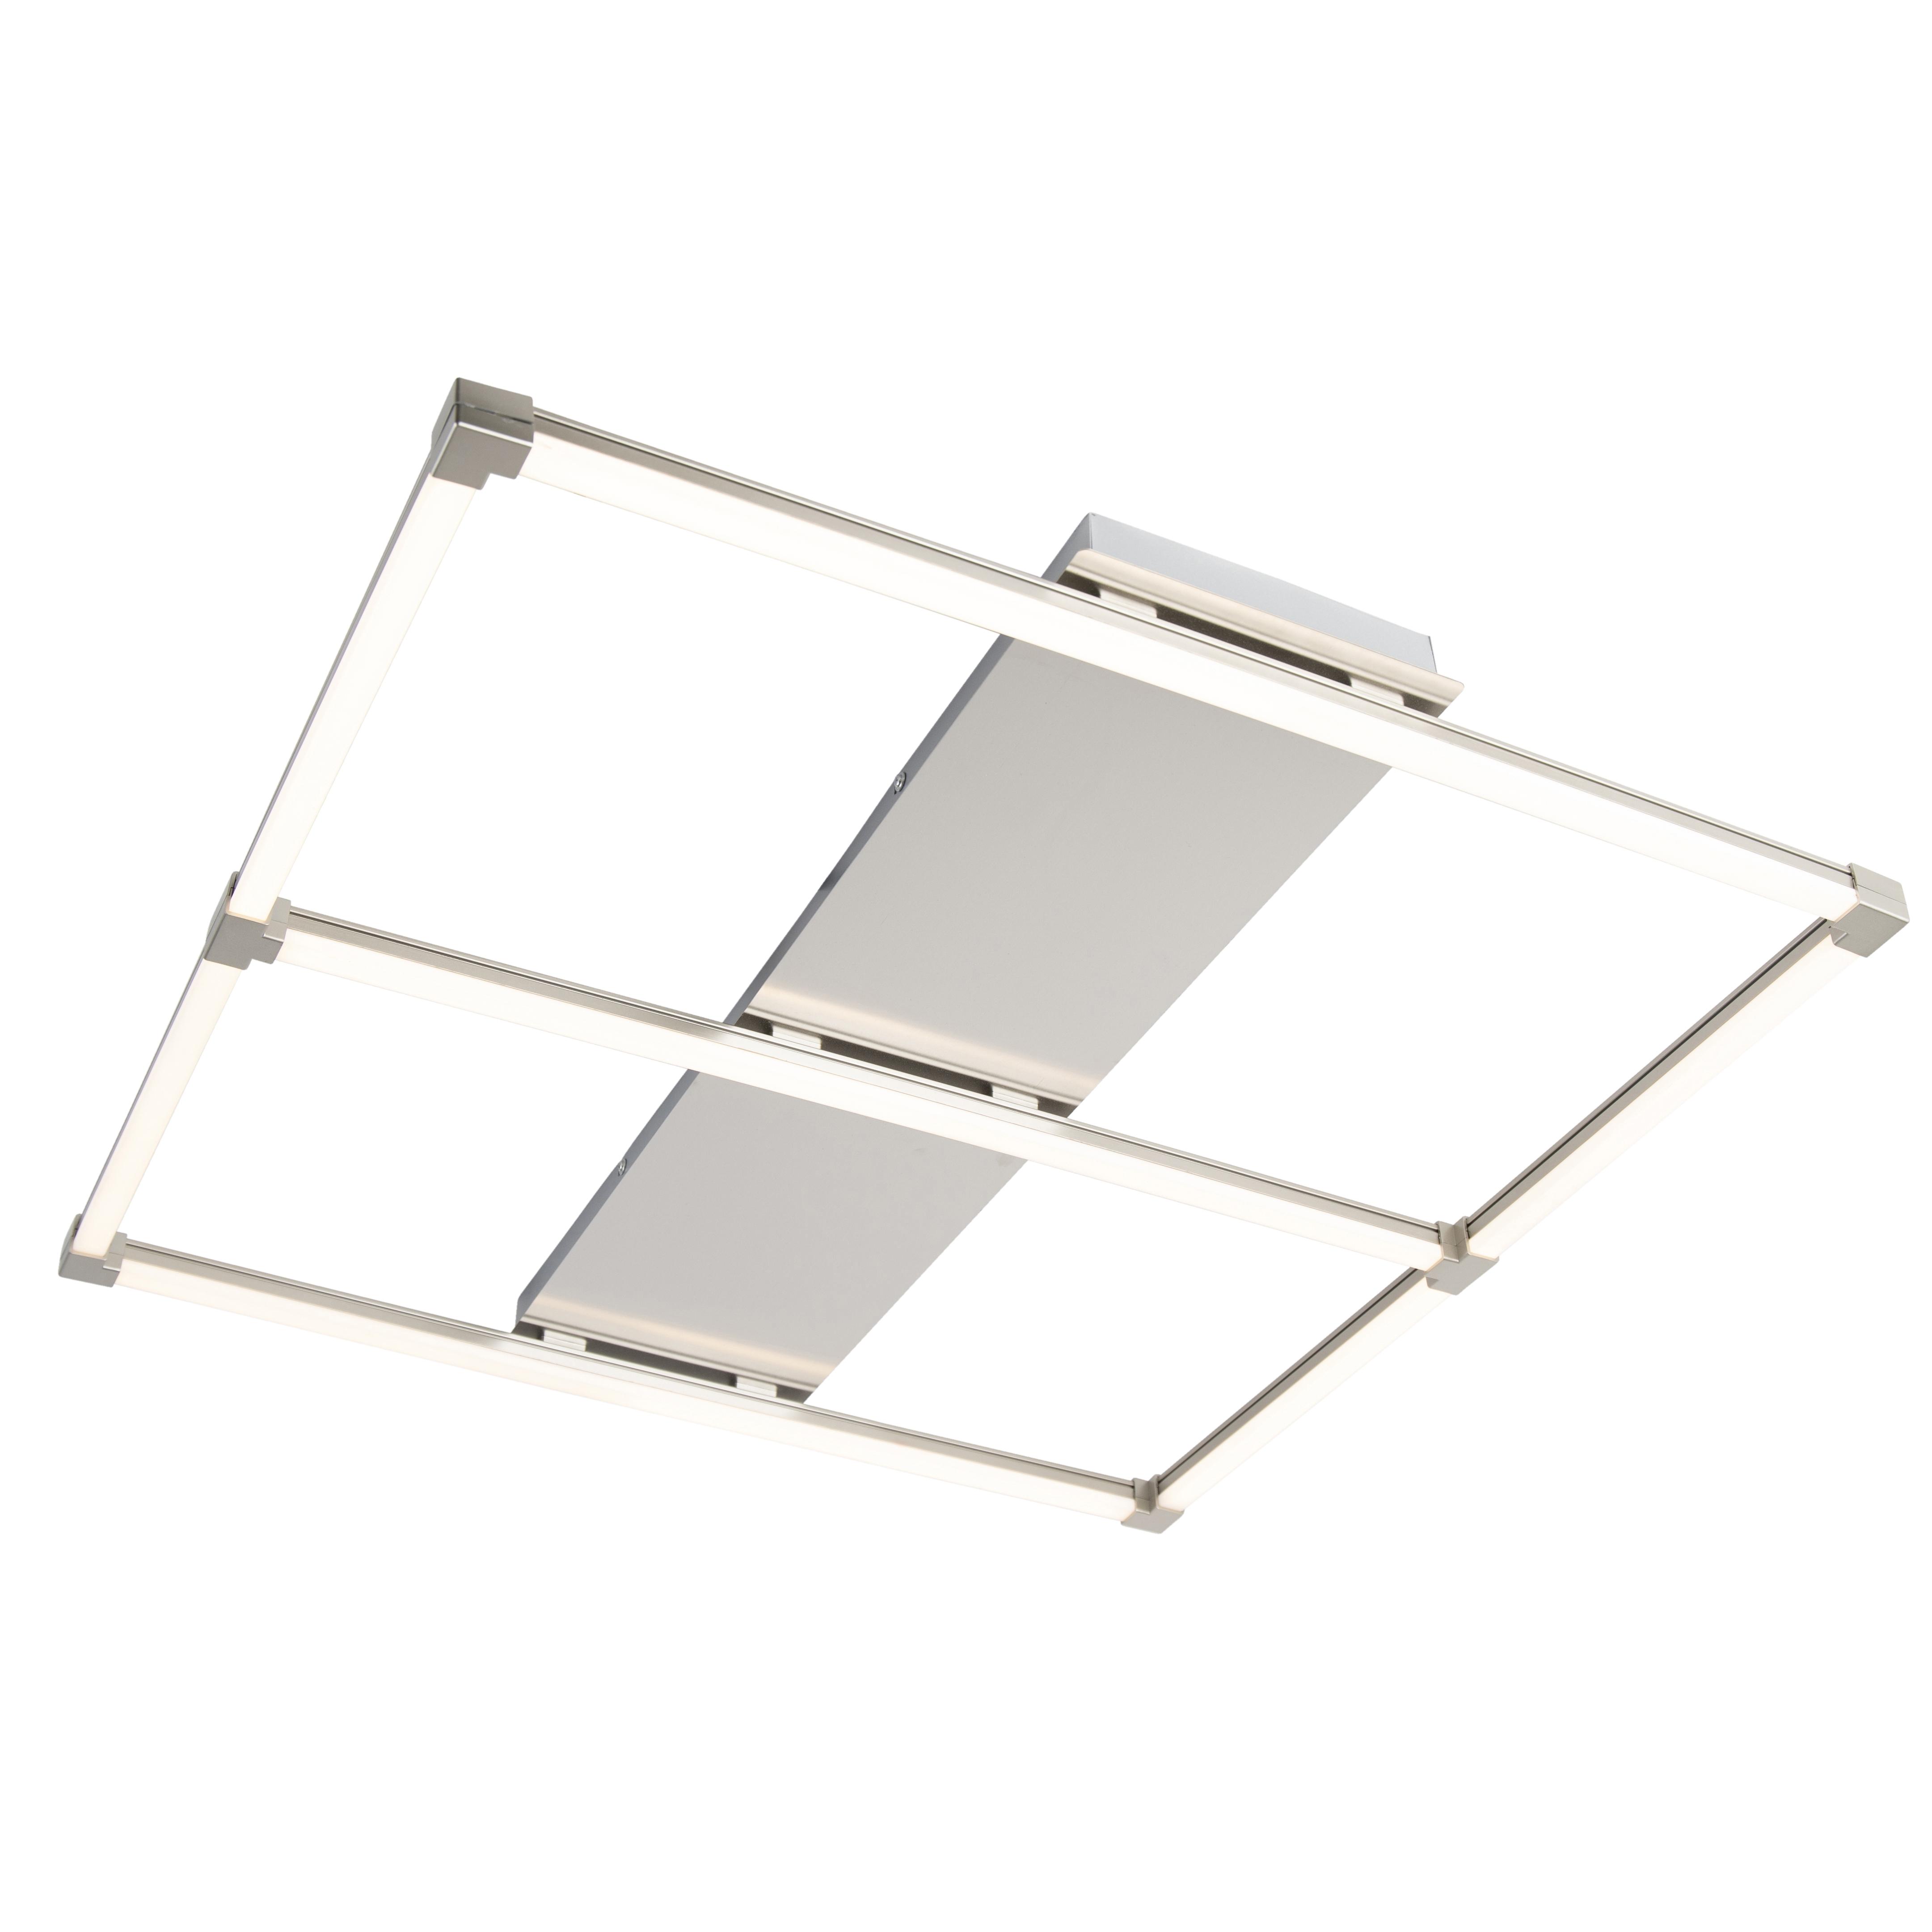 Design vierkante plafondlamp staal incl. LED - Plazas basic